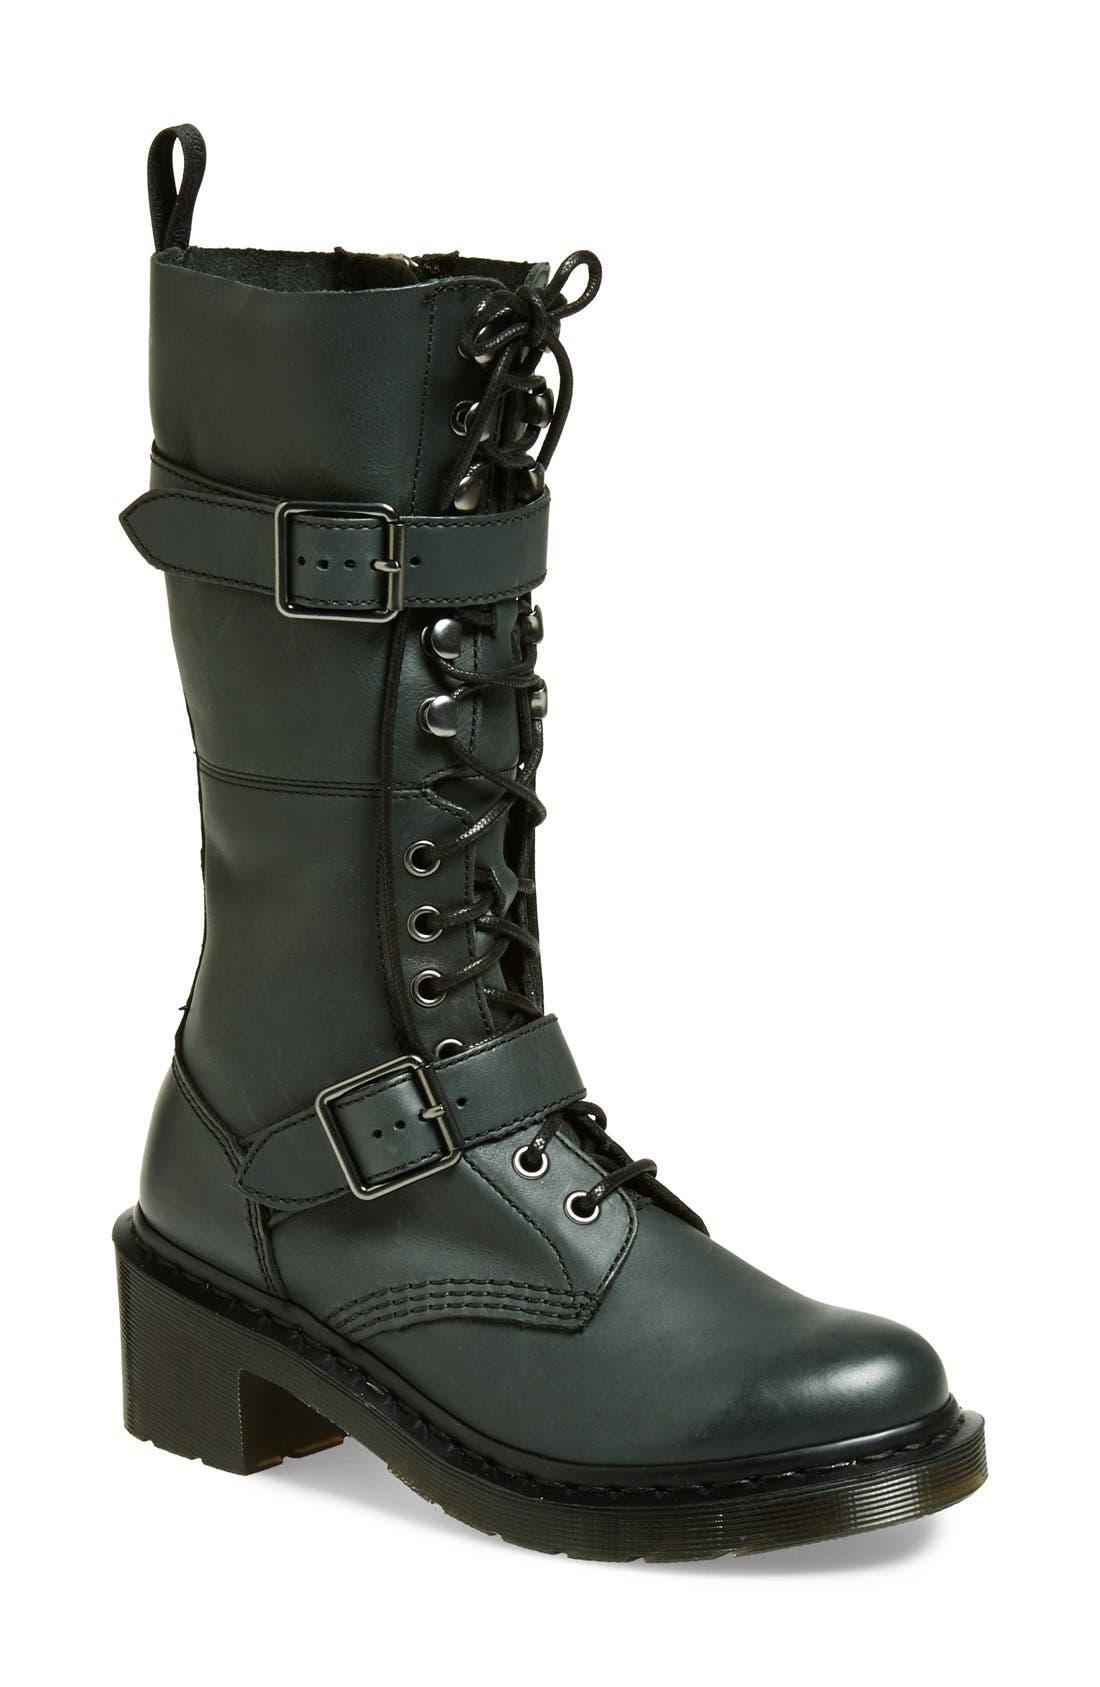 Alternate Image 1 Selected - Dr. Martens 'Josefa' Military Boot (Women)